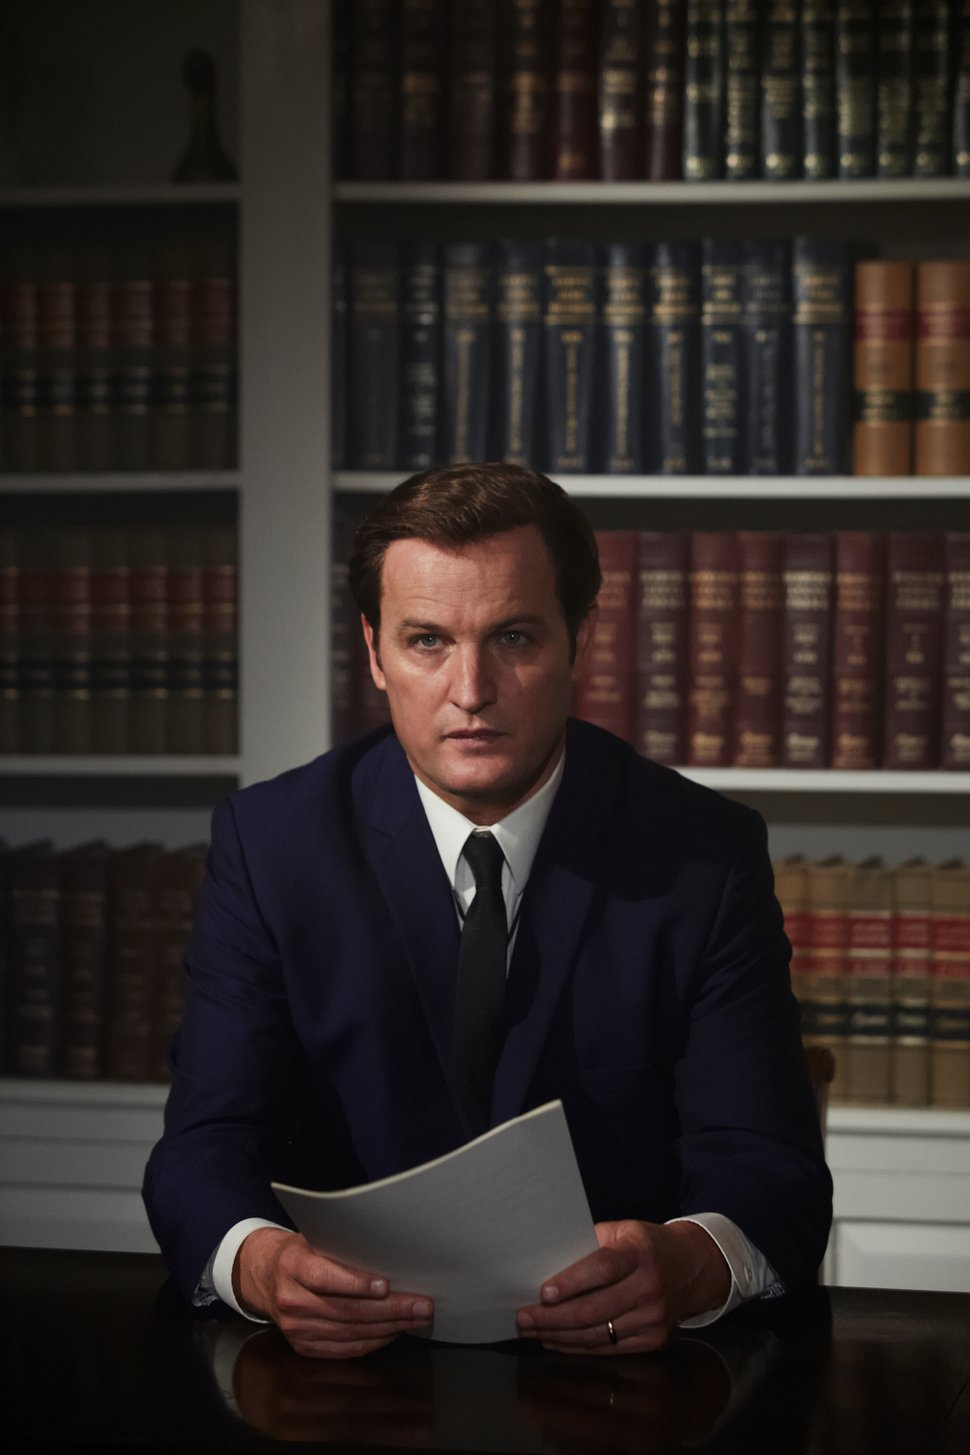 Jason Clarke as Ted Kennedy in a scene from